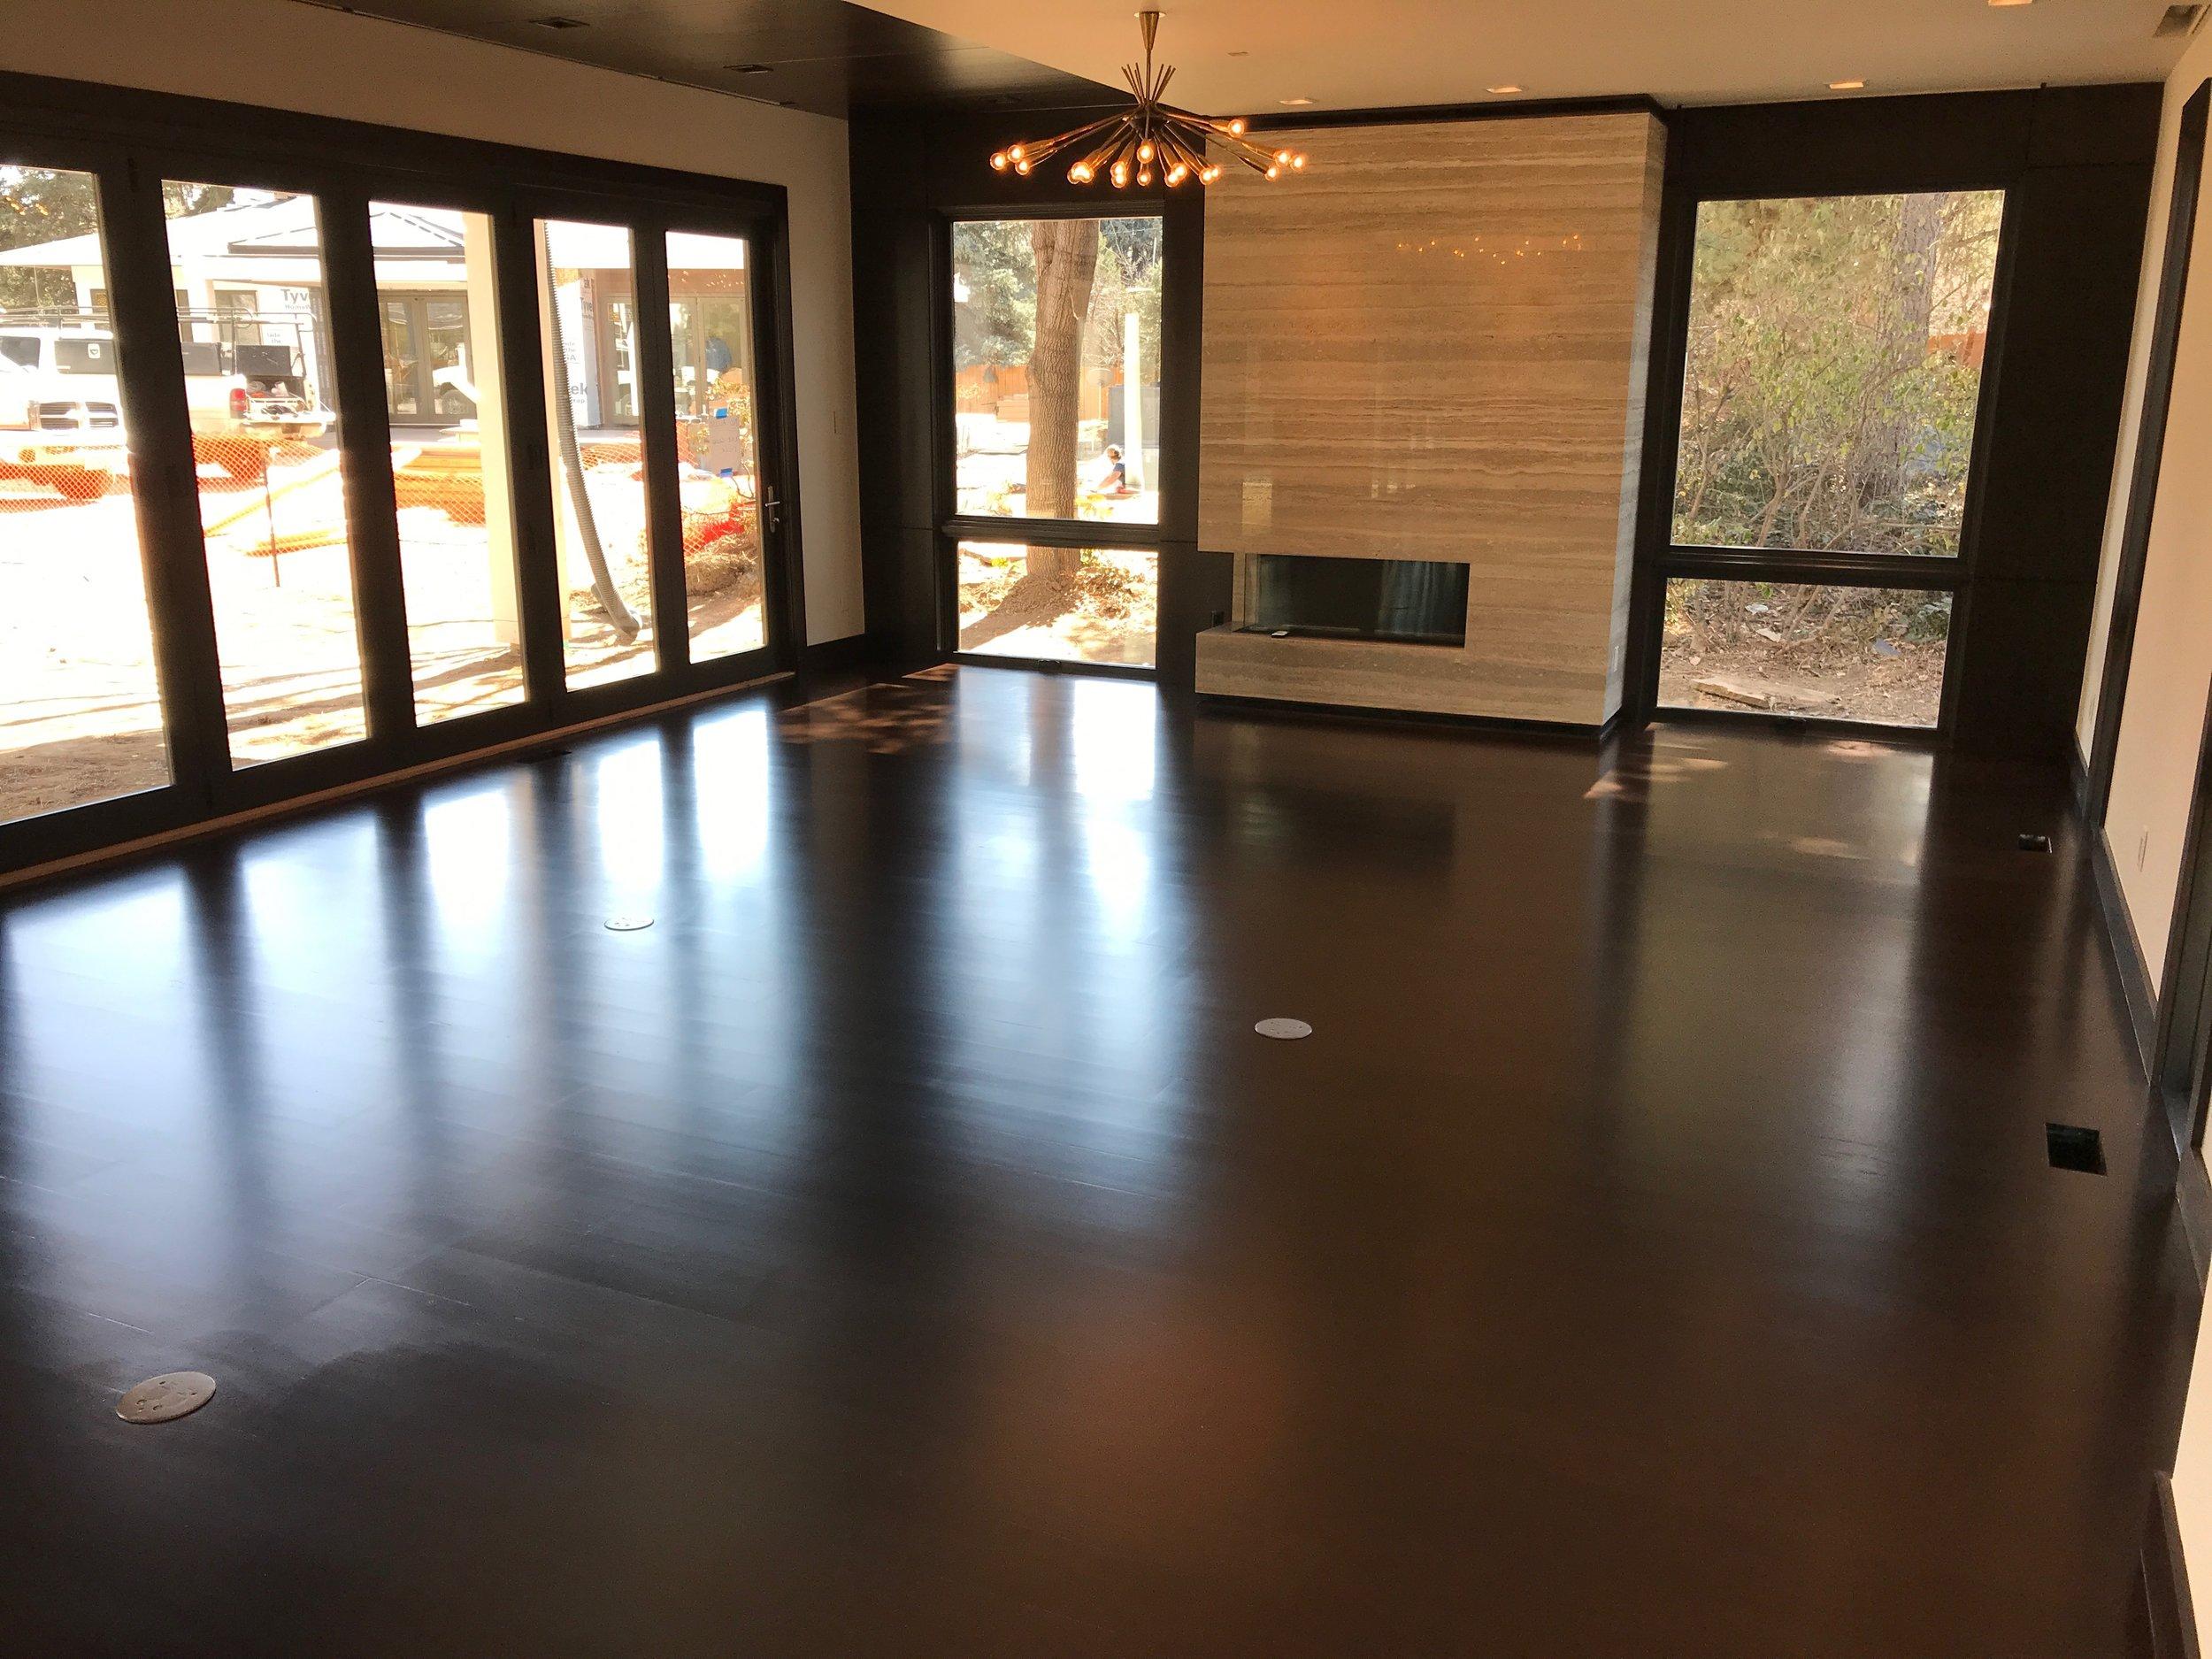 Hardwood Floors - Hardwood floor installations, maintenance, and refinishing.